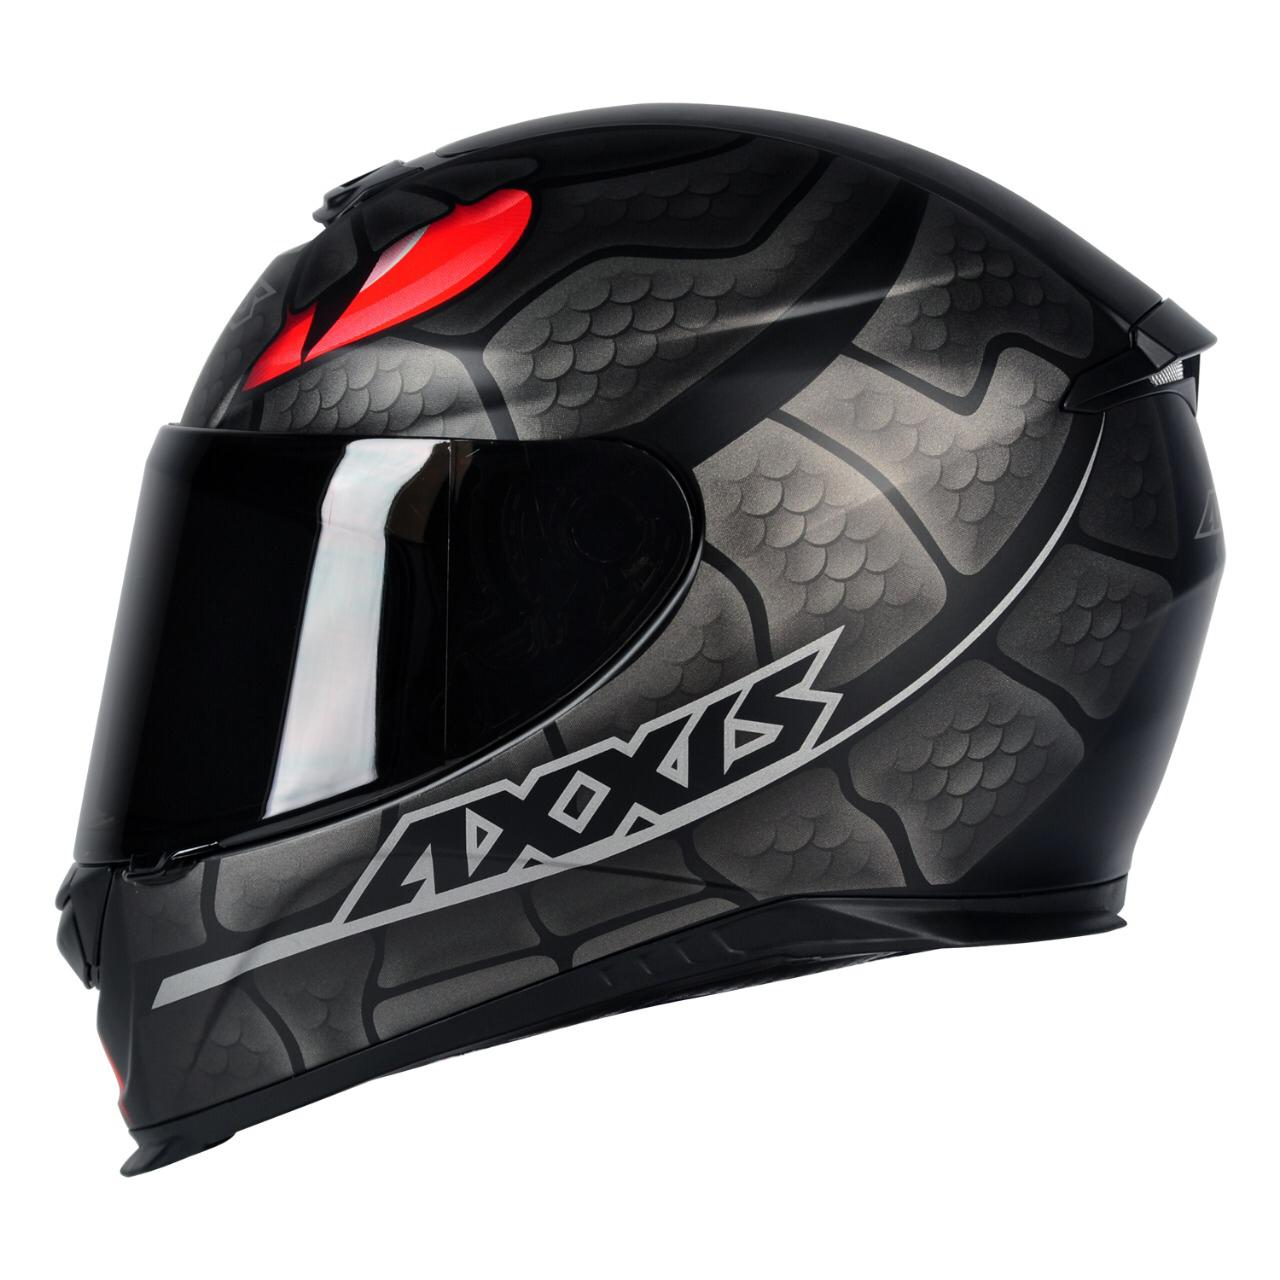 Capacete Eagle Snake Preto e Cinza Fosco Axxis  - Motorshopp